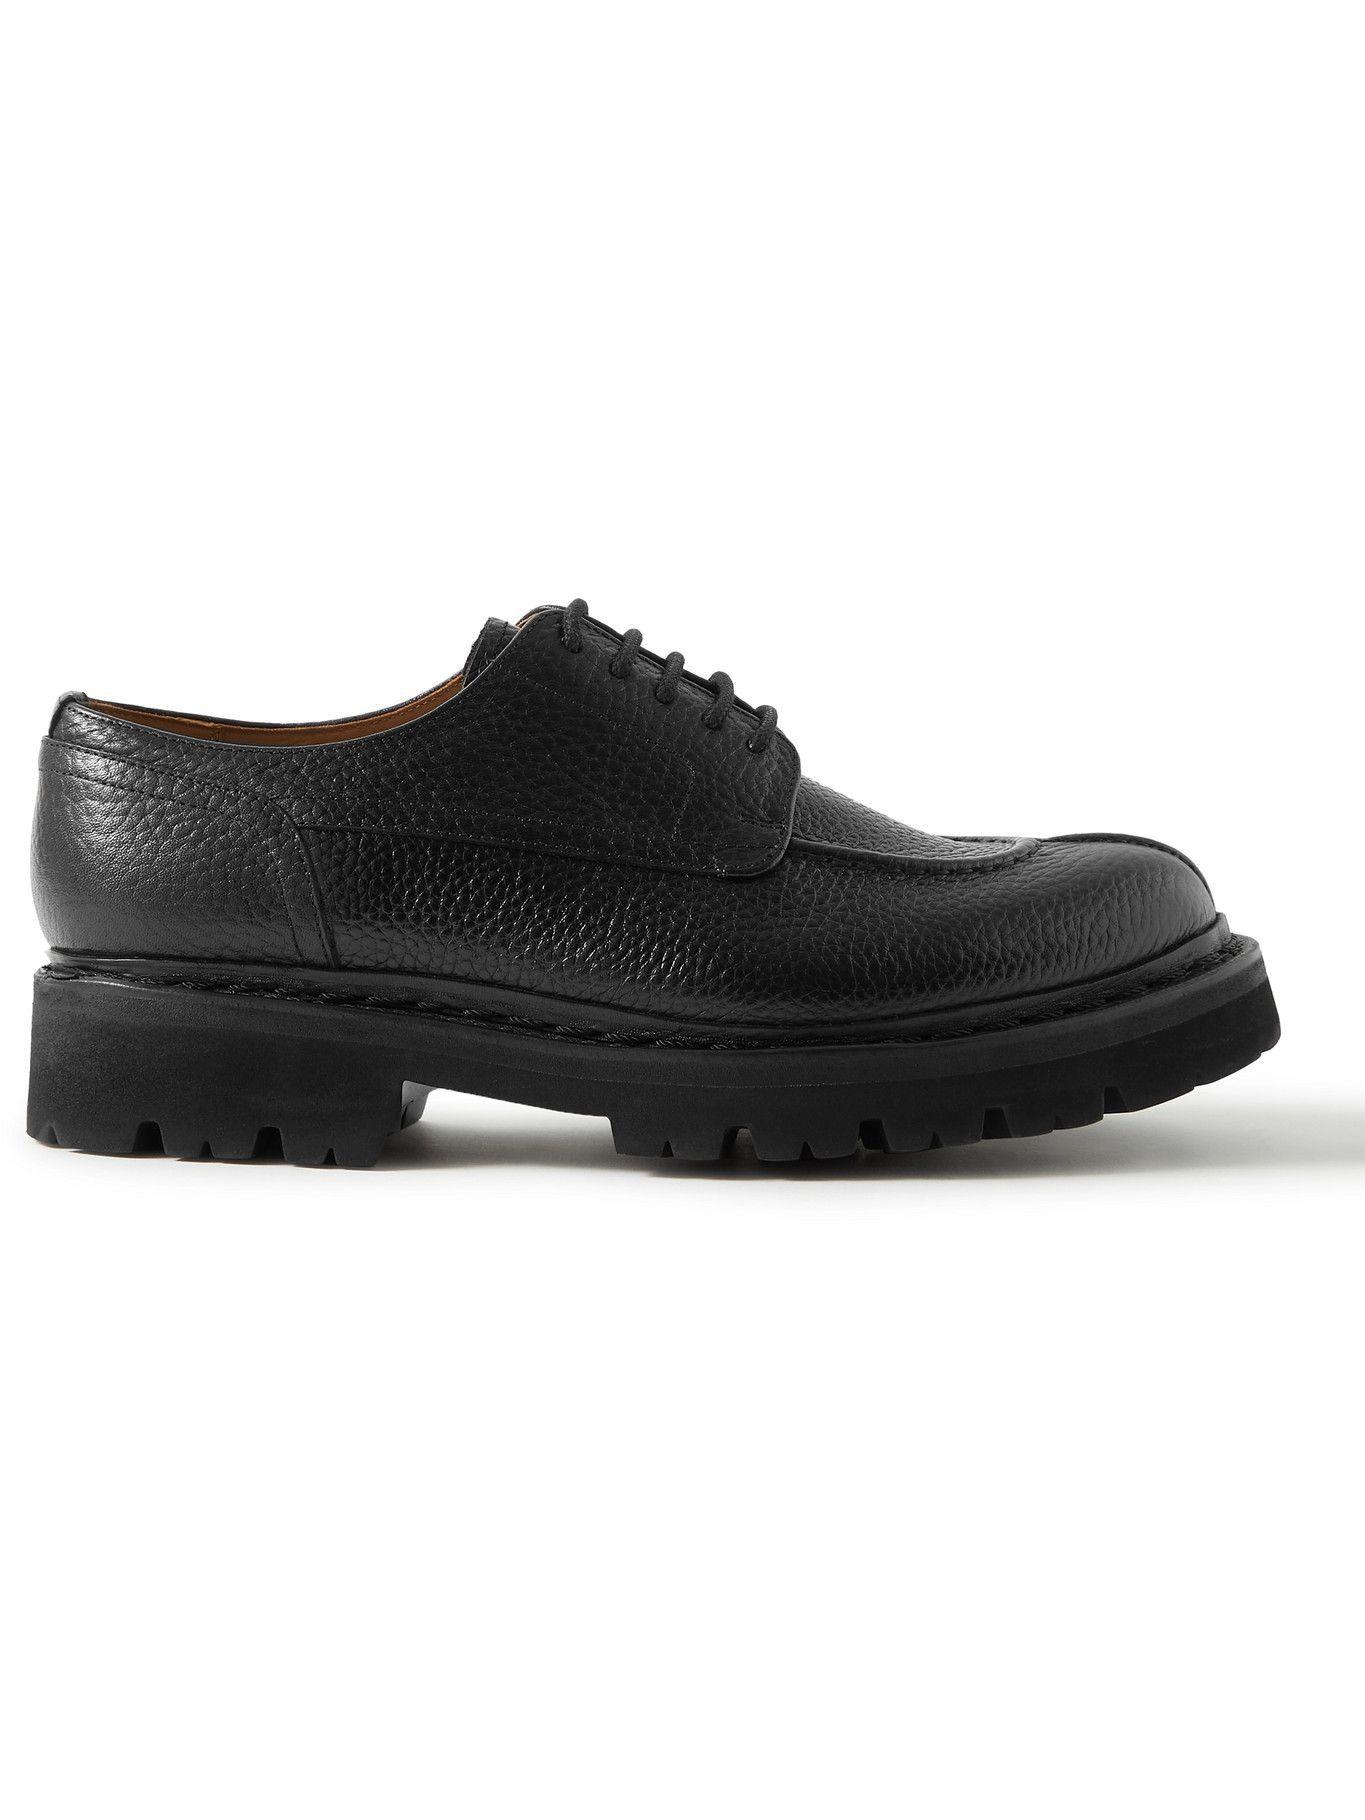 Photo: Grenson - Joel Full-Grain Leather Derby Shoes - Black